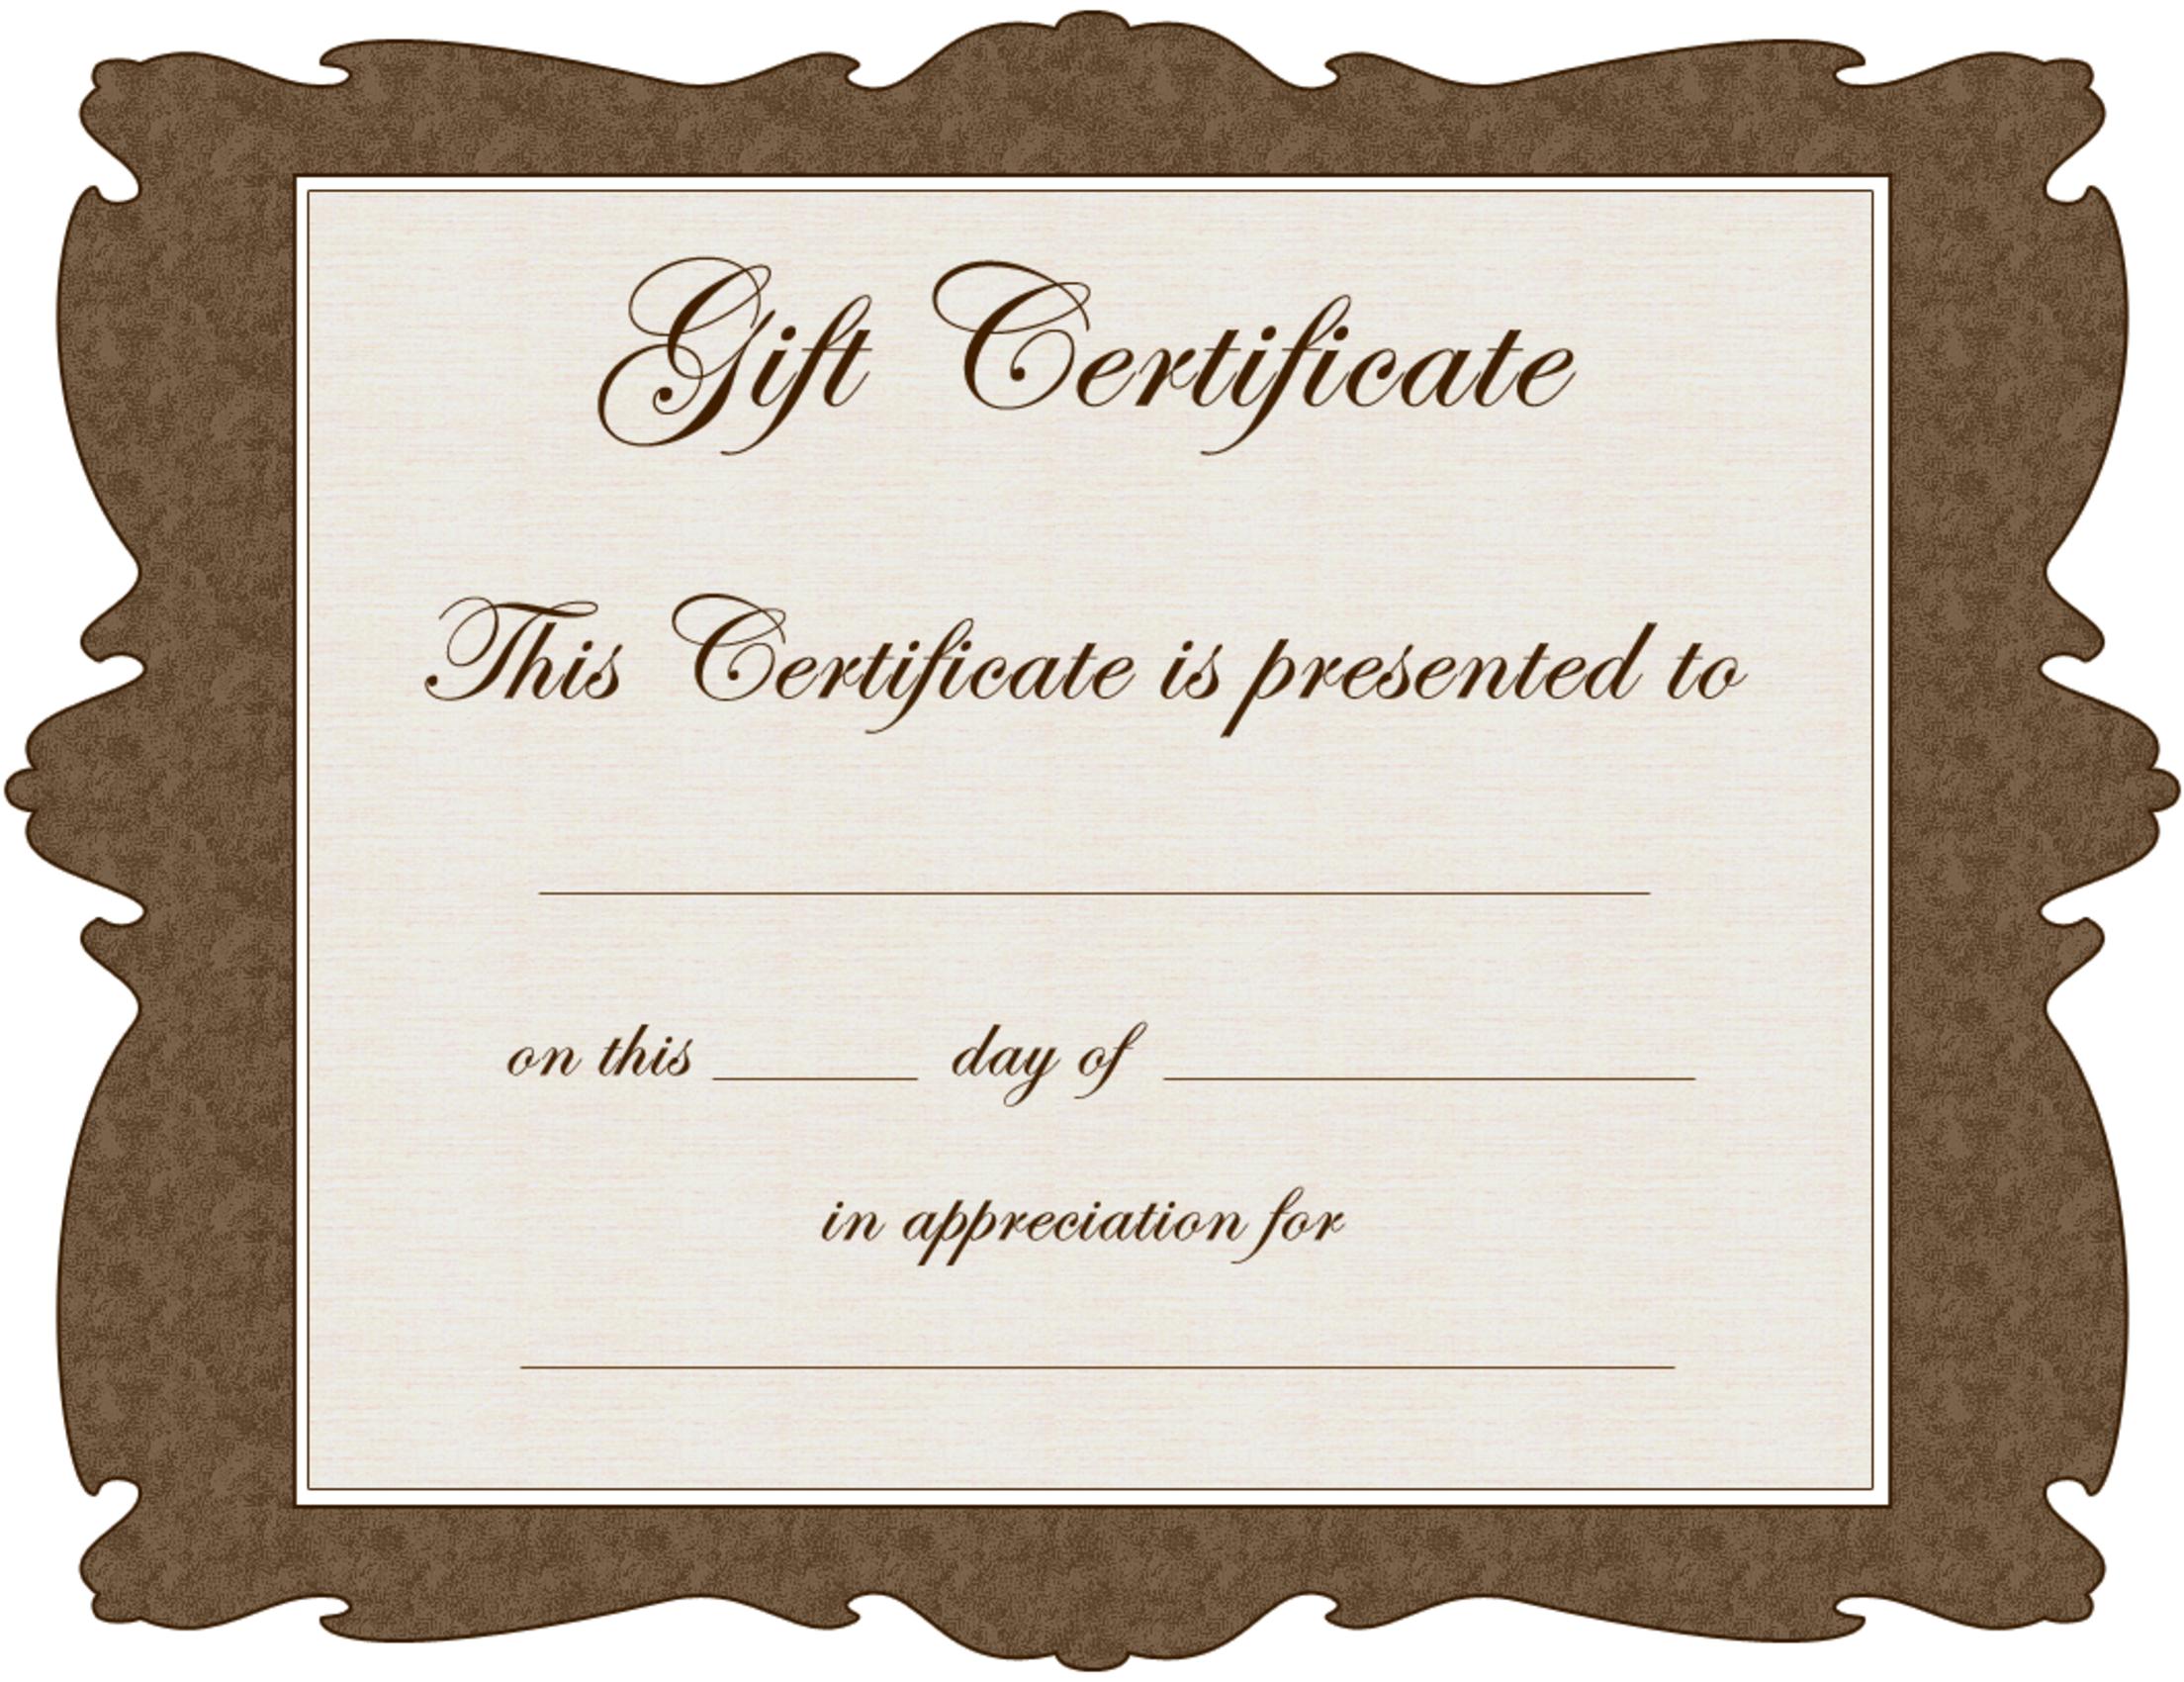 we appreciate you | Yolie\' | Pinterest | Free gift certificate template